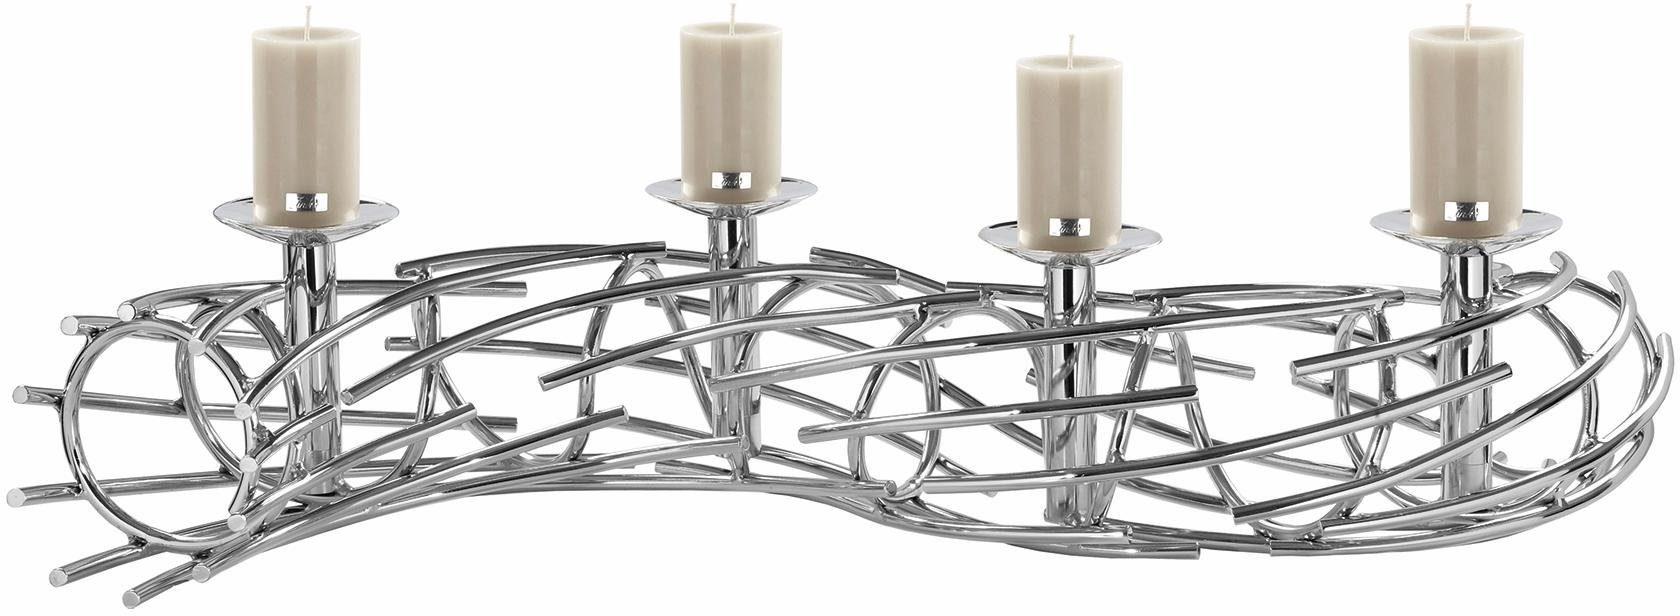 Fink Kerzenständer »CORONA« 4-flammig